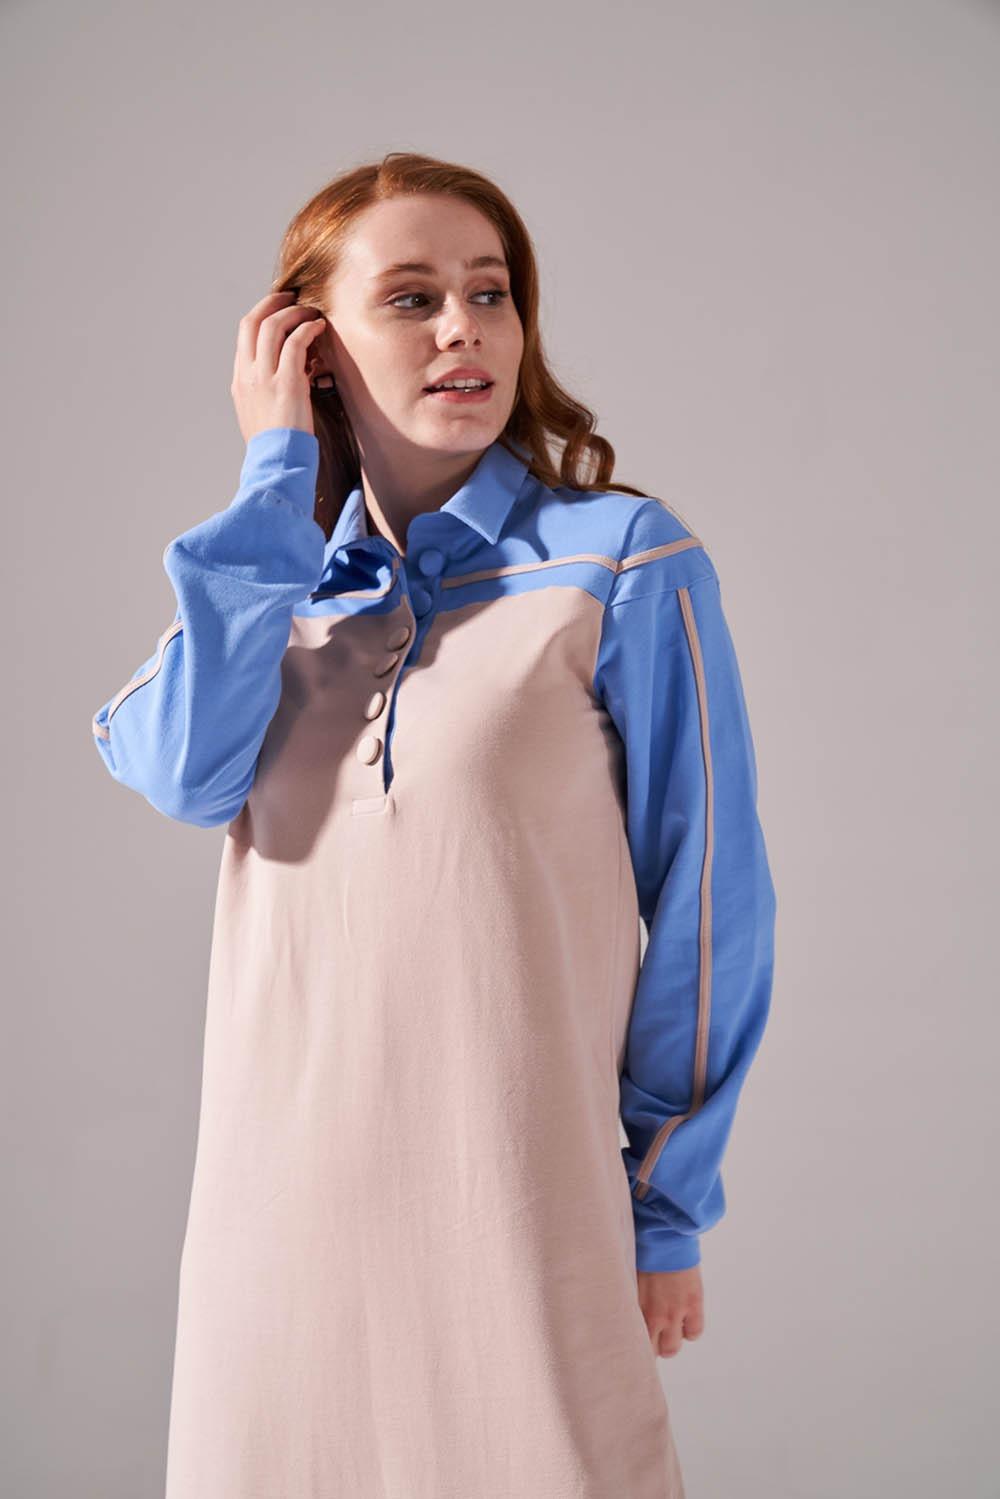 İki İplik Polo Yaka Mavi Elbise